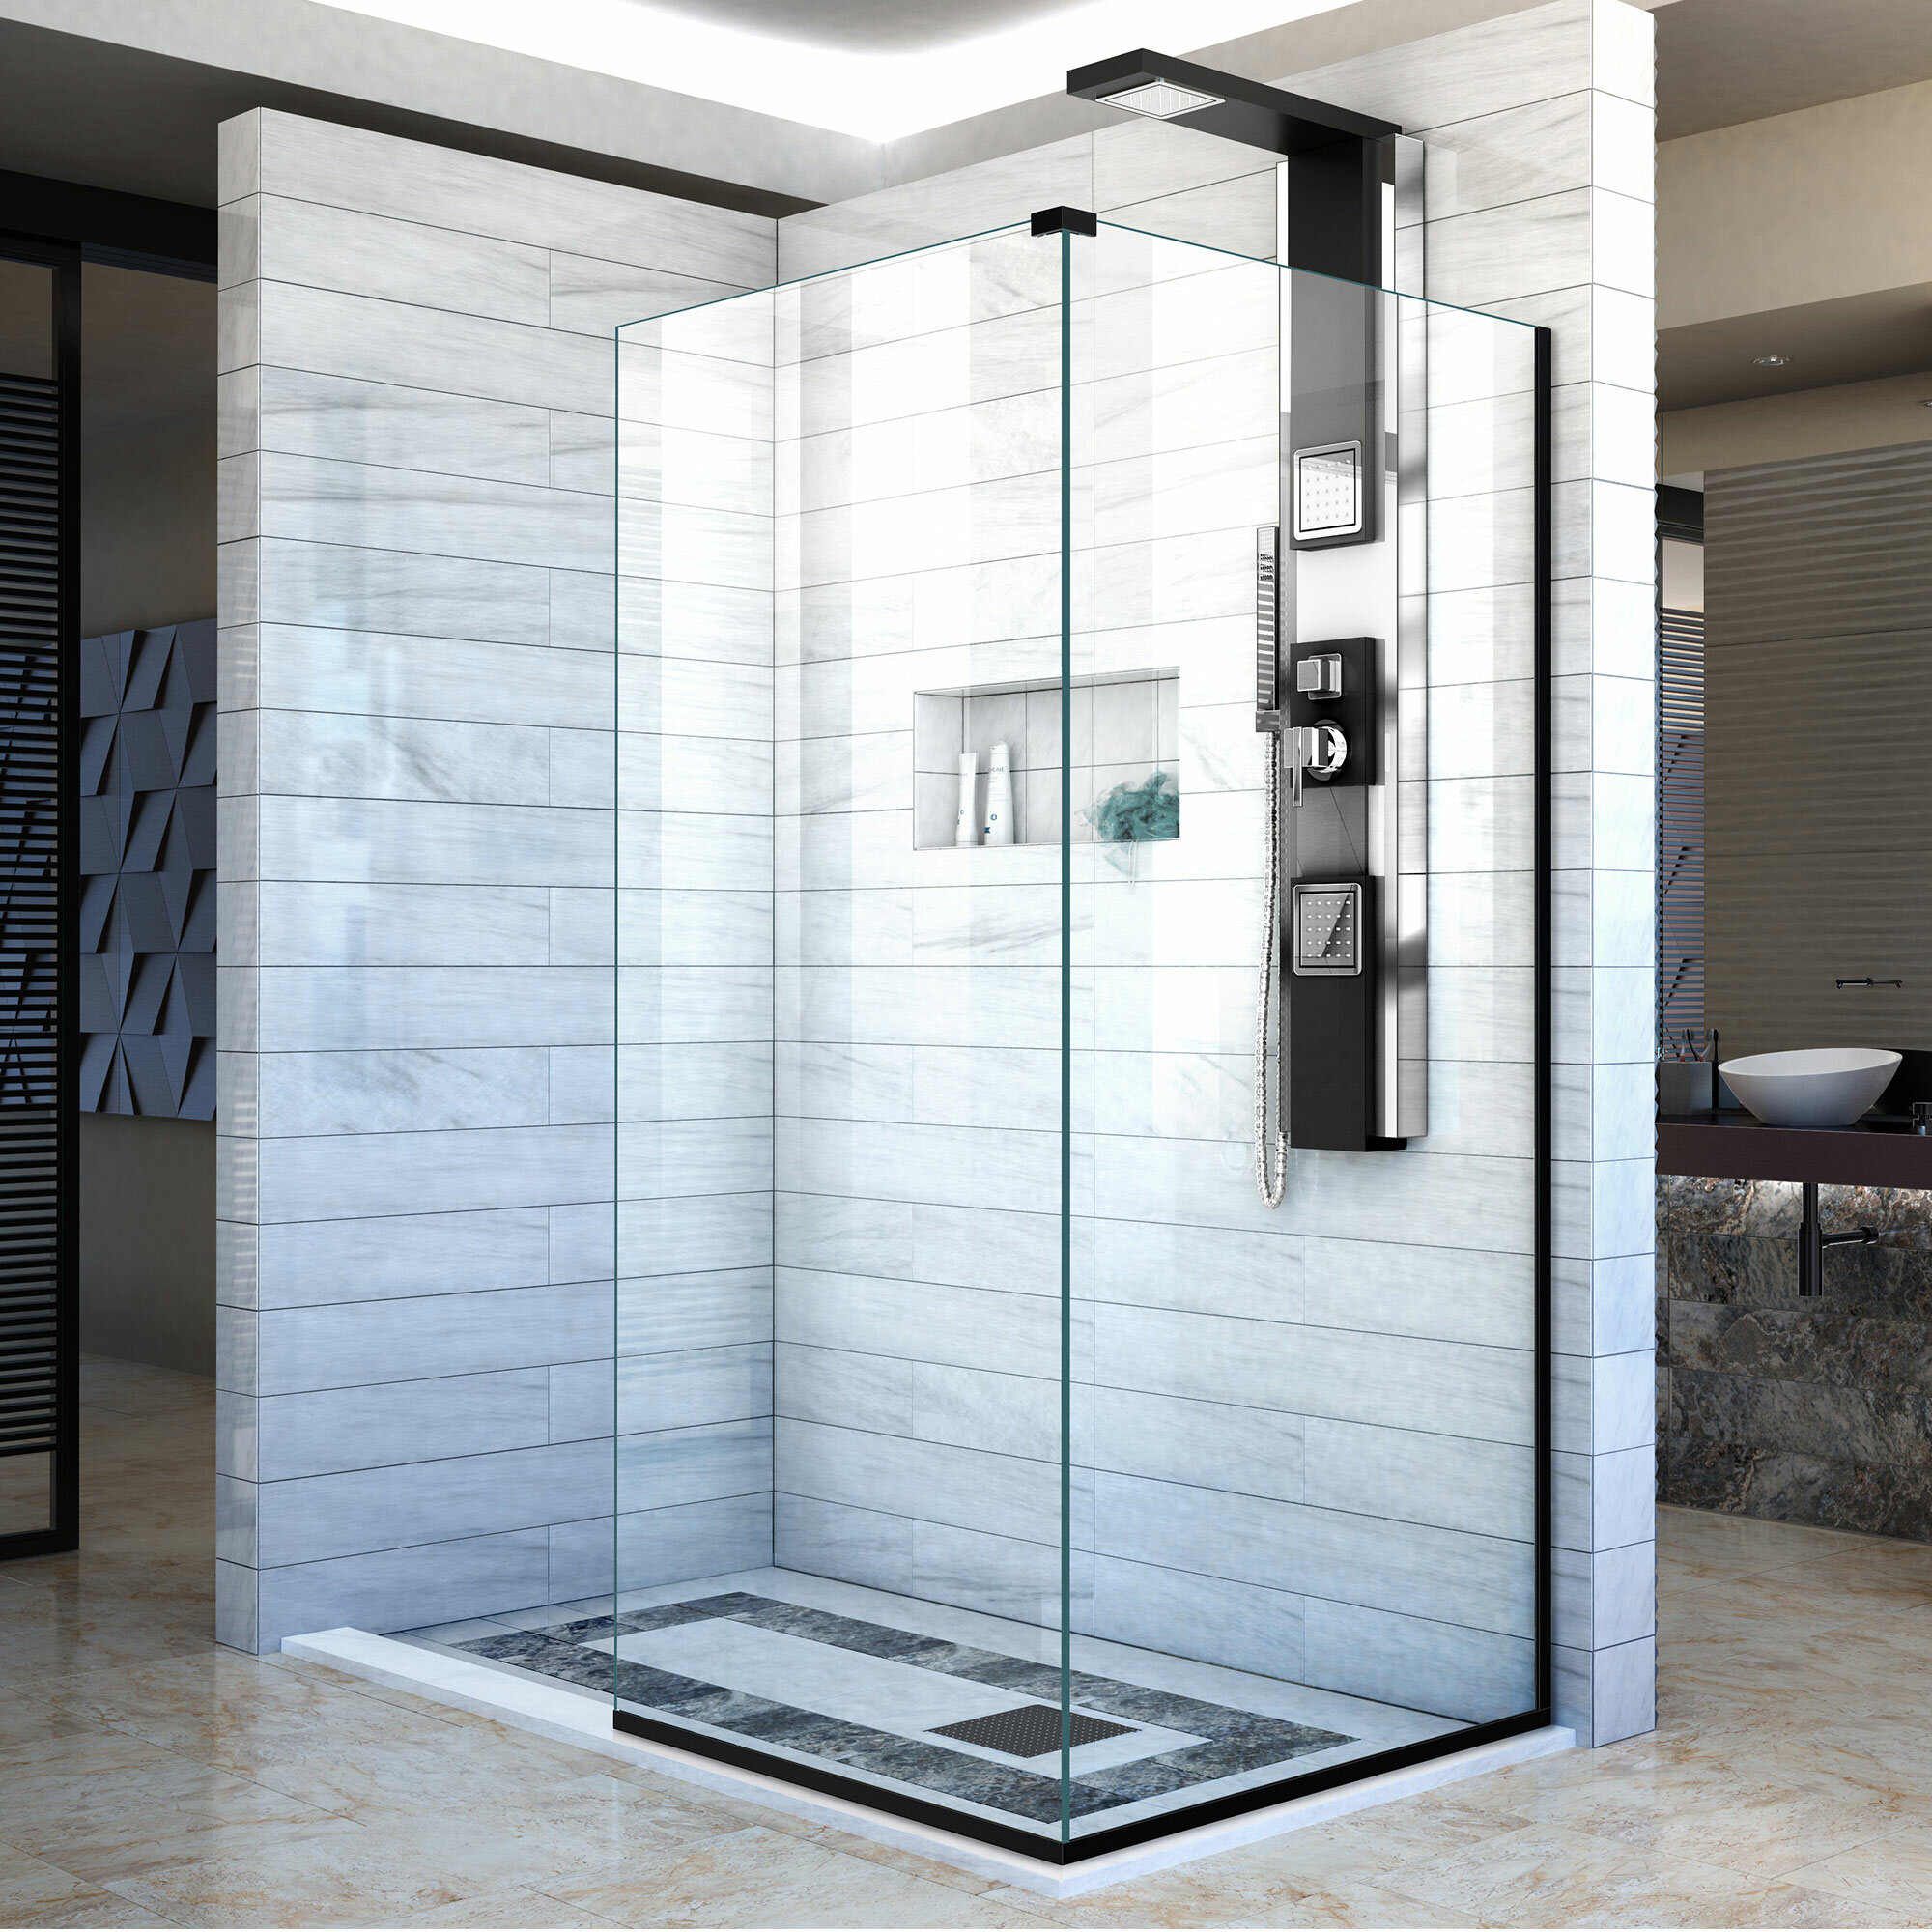 Linea 34 X 72 Frameless Shower Door With Clearmax Technology